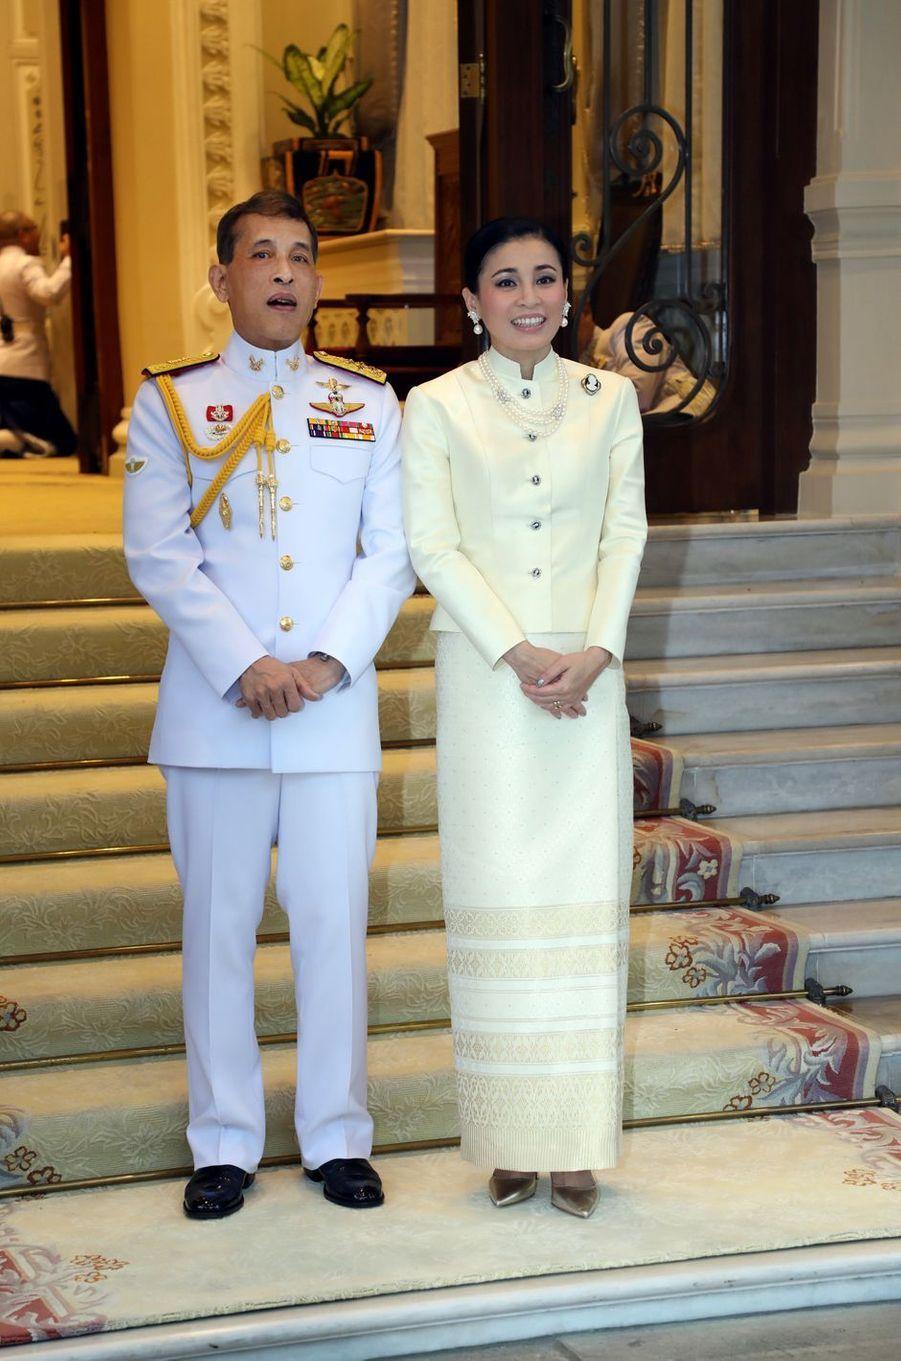 Le roi Maha Vajiralongkorn (Rama X) et la reine Suthida de Thaïlande à Bangkok, le 21 novembre 2019